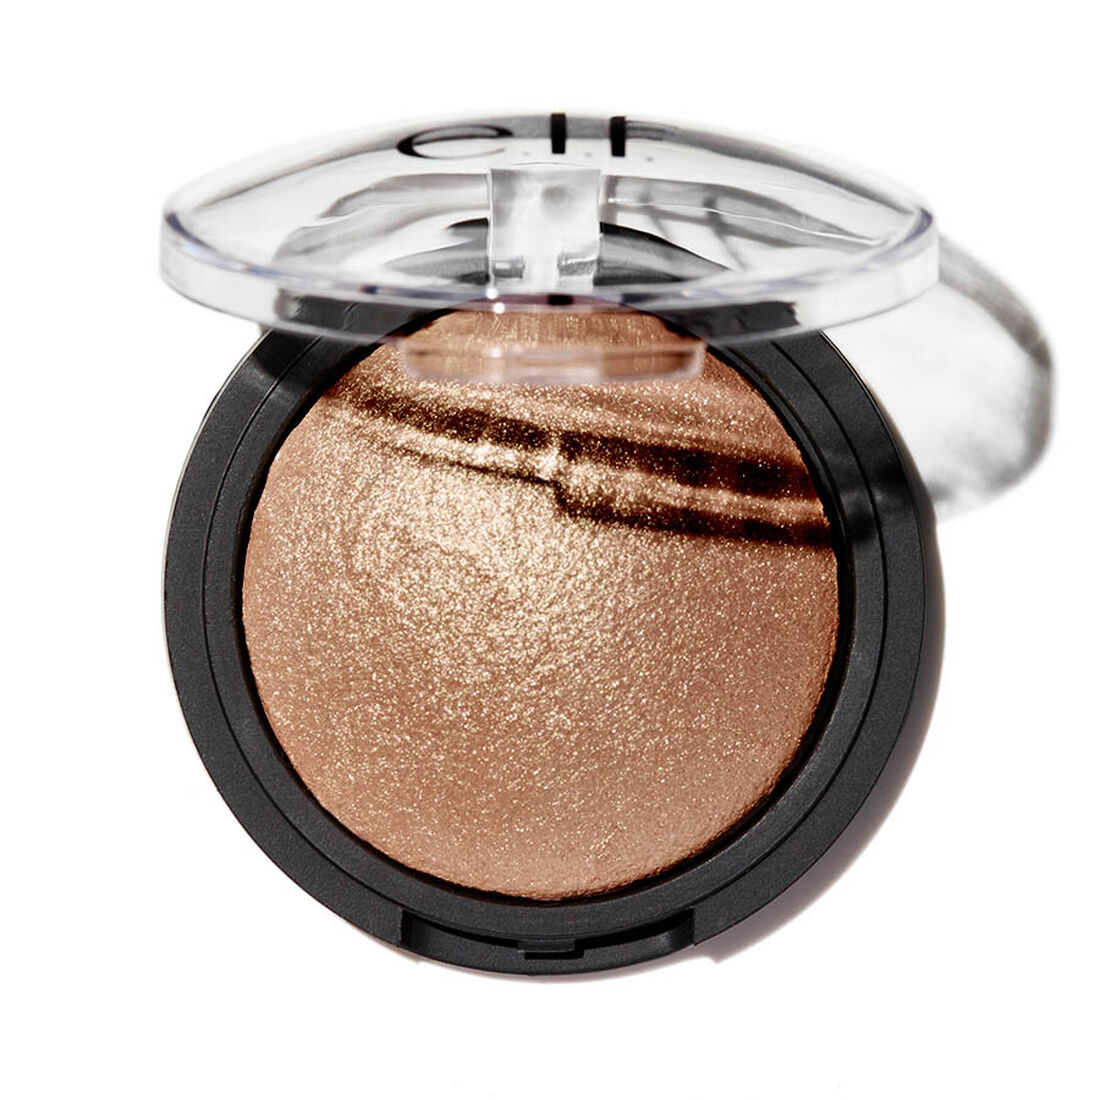 E.l.f Cosmetics - Baked Bronzer